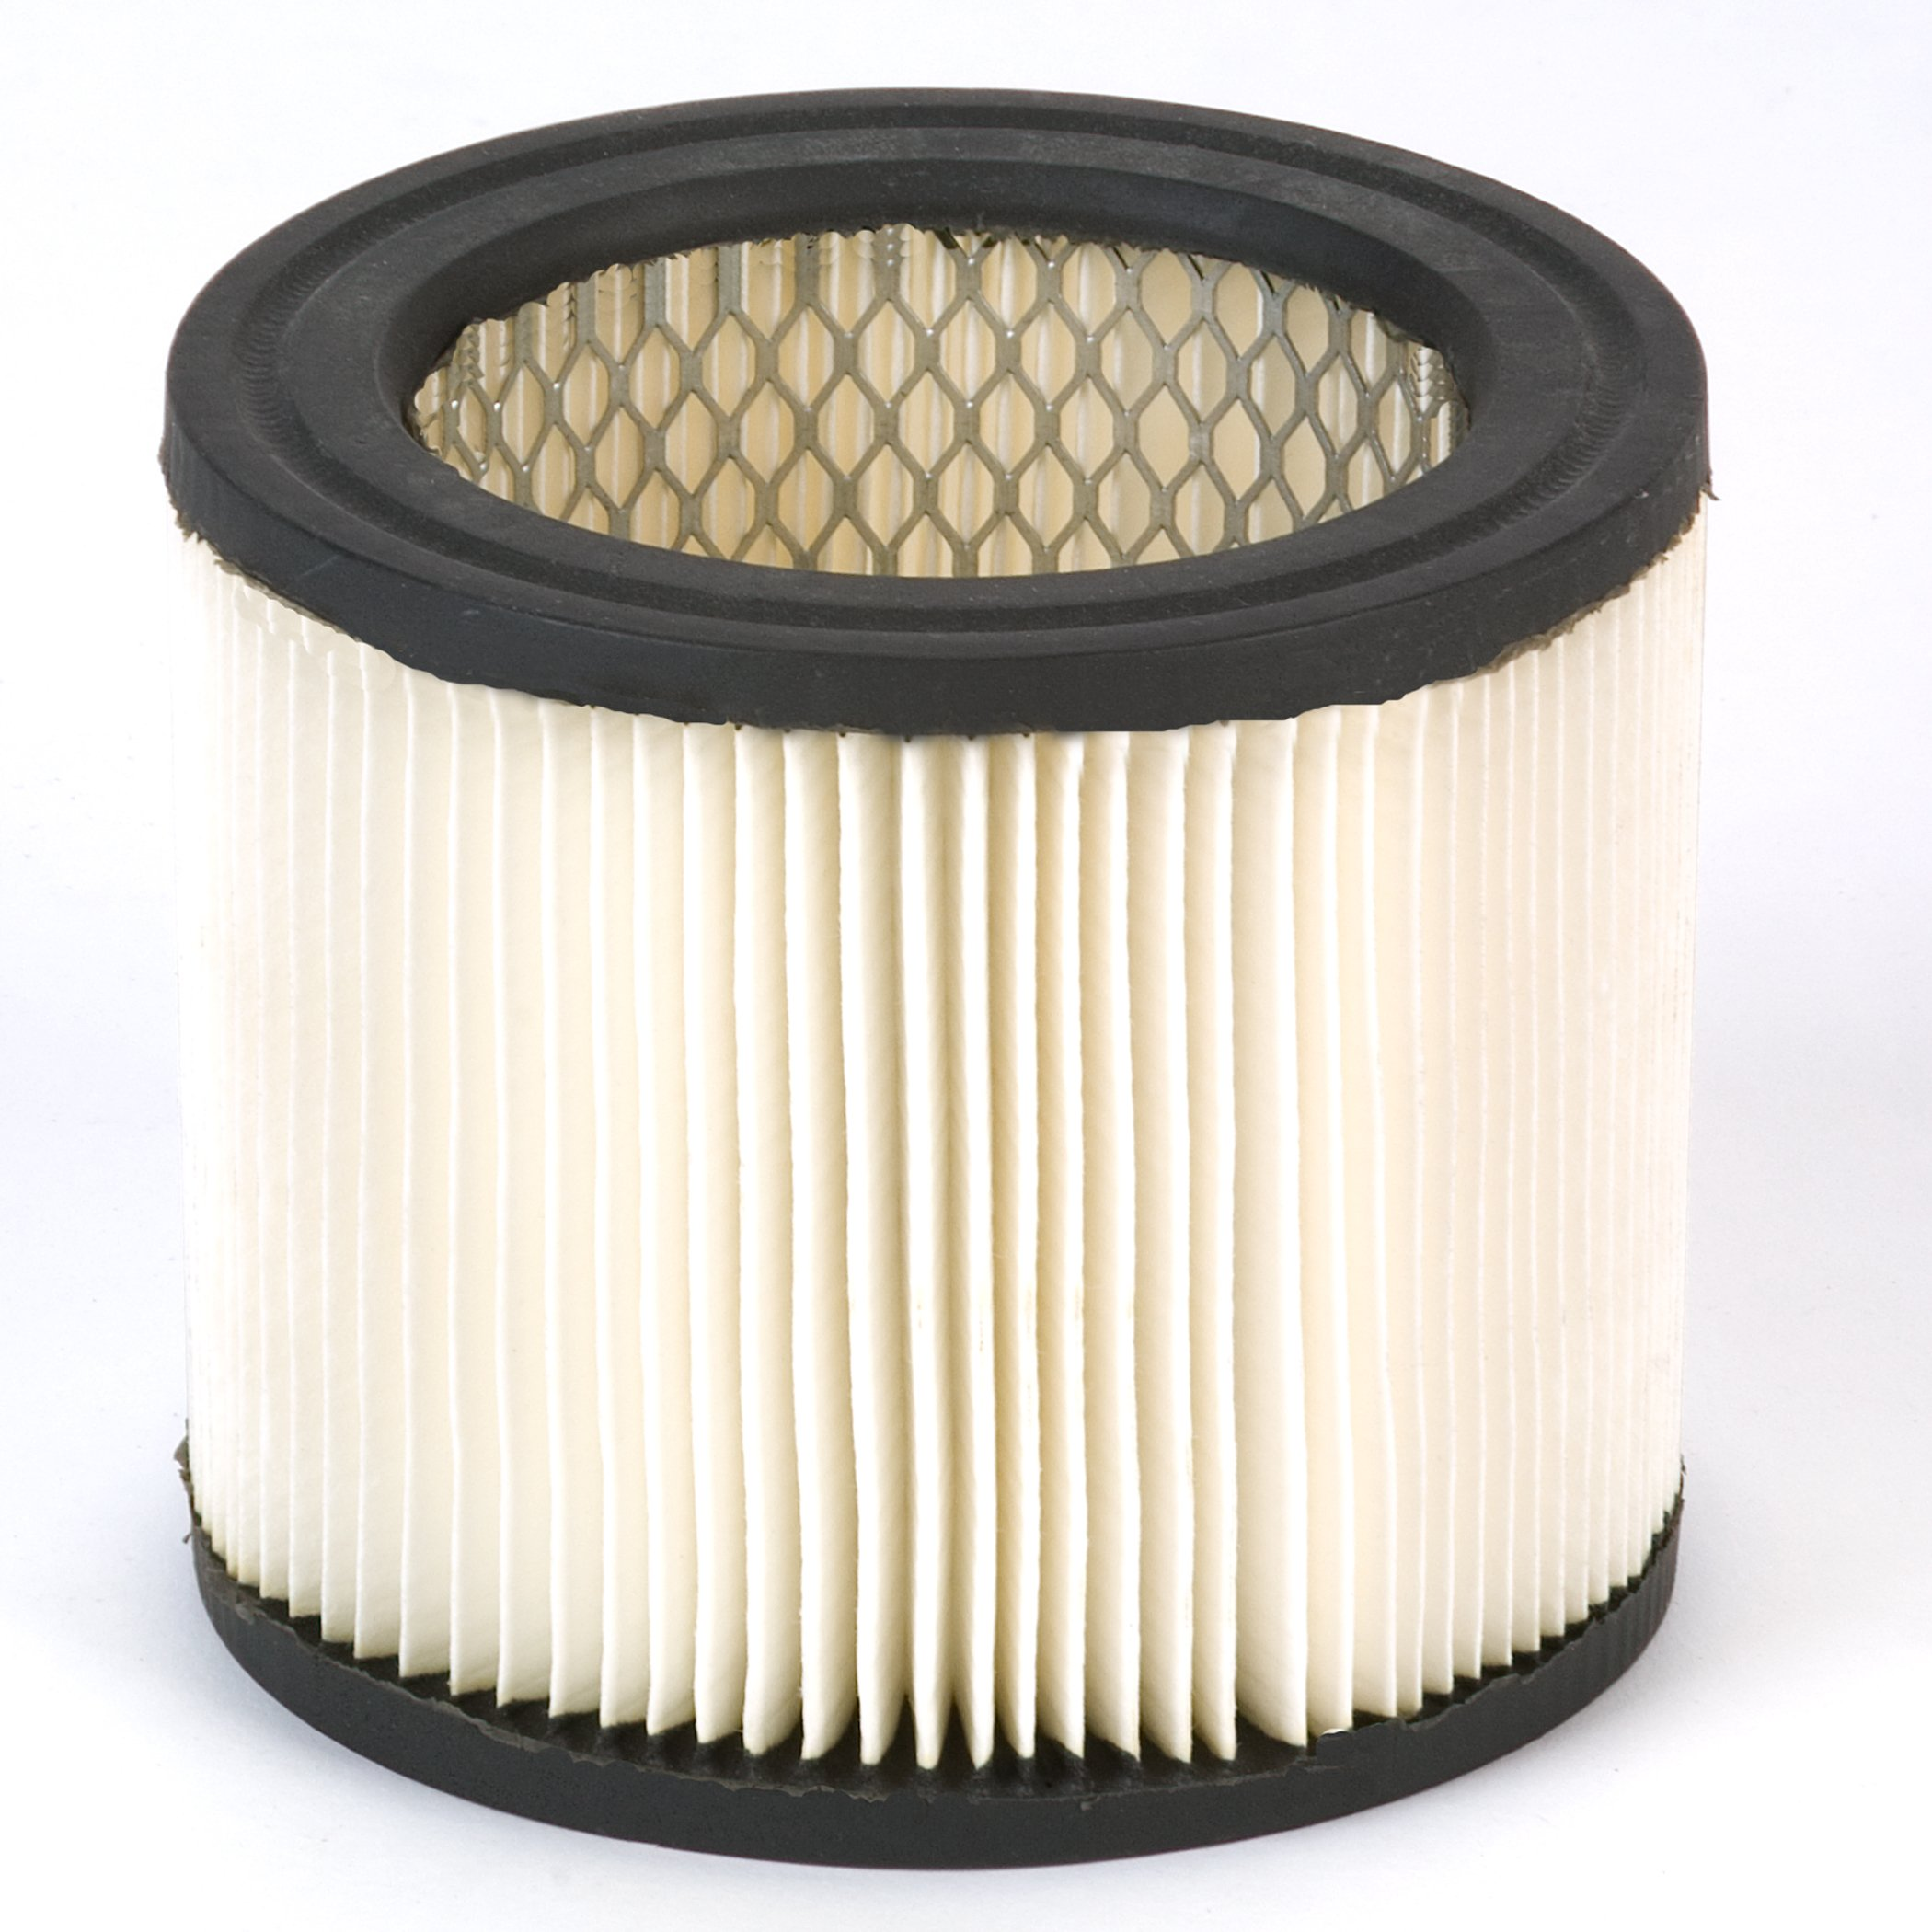 Shop Vac 903-98 HangUp Wet/Dry Vacuum Cartridge Filter